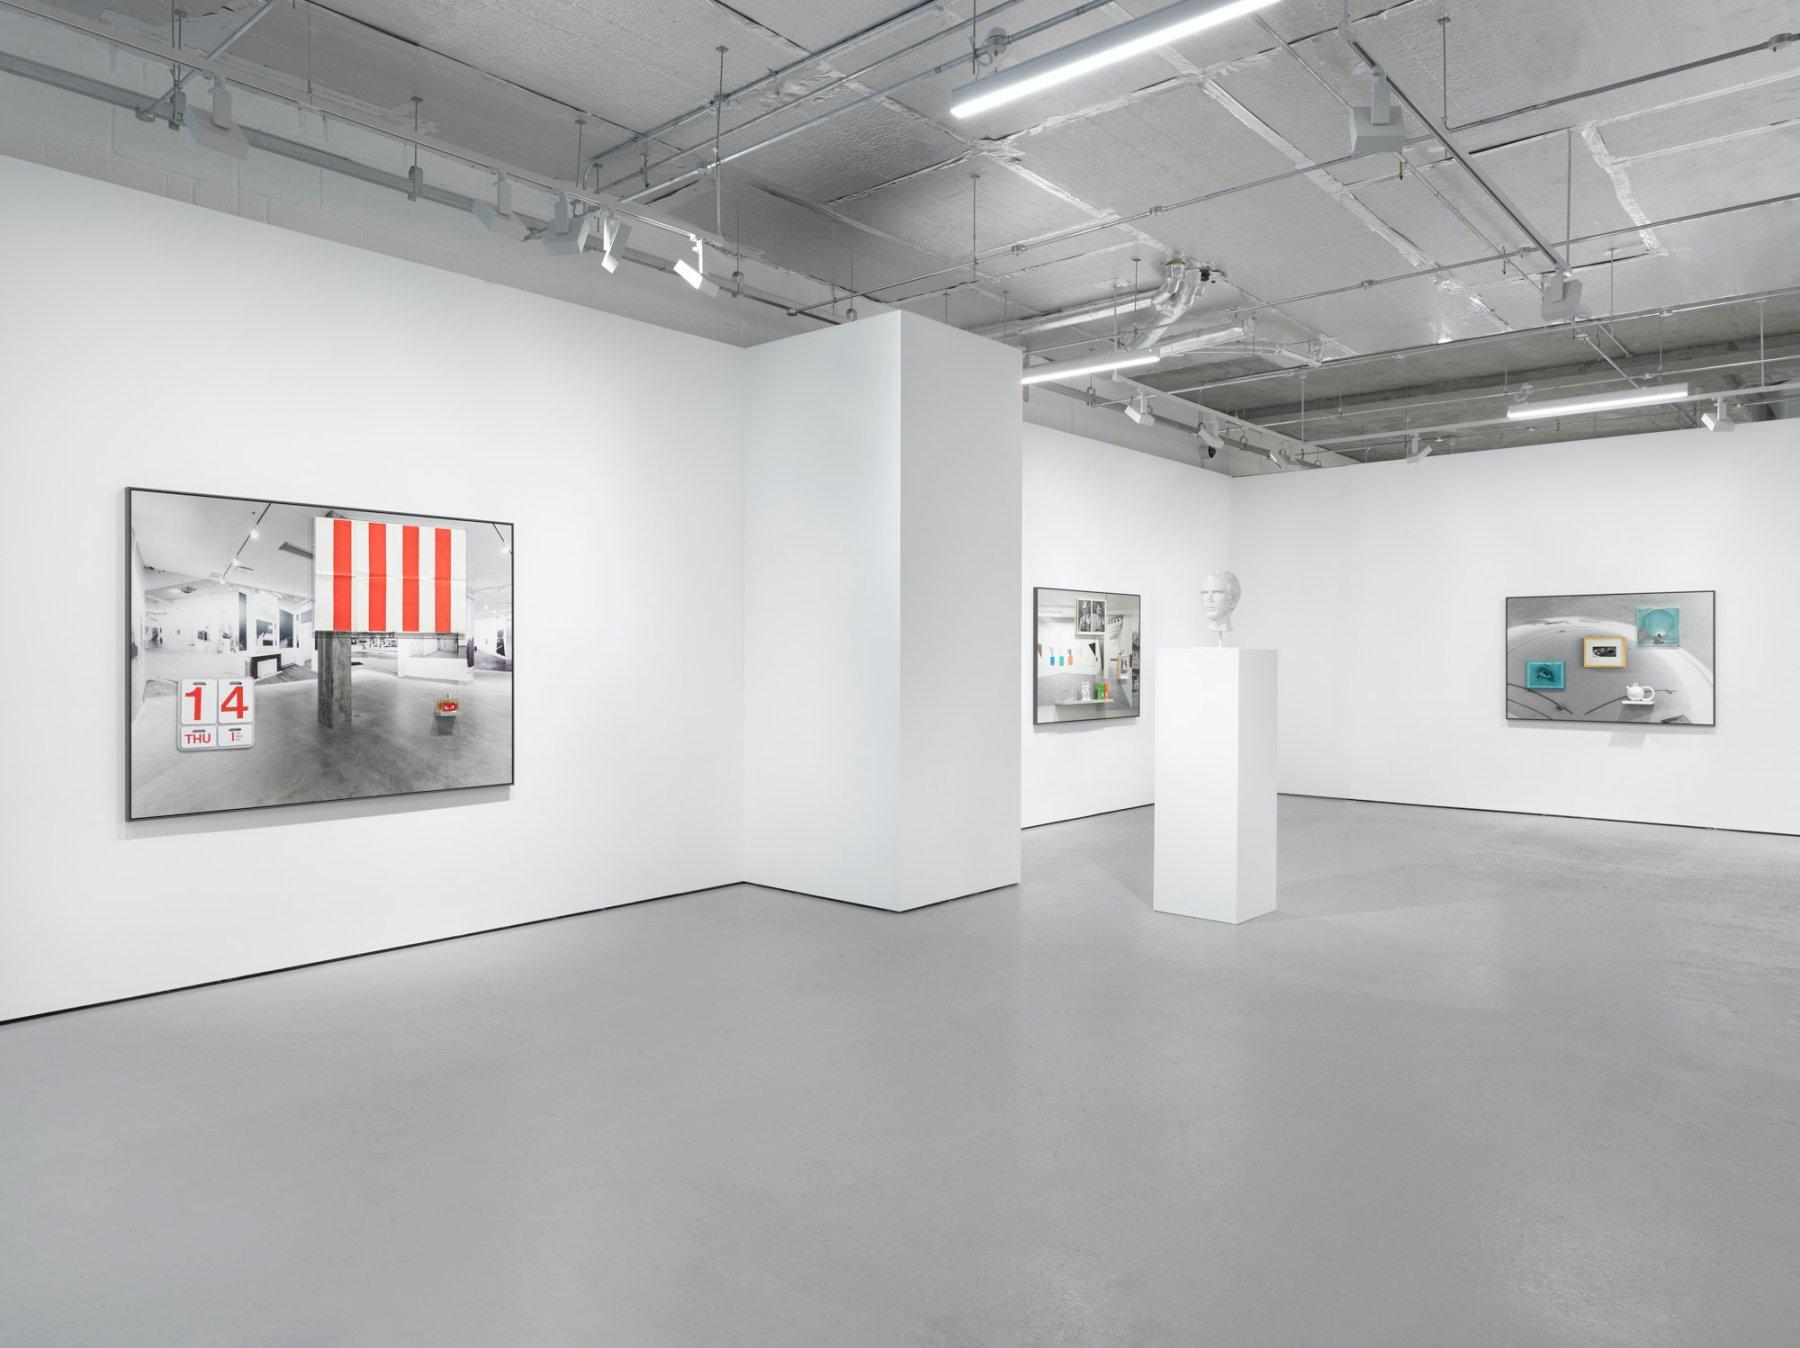 Lisson-Gallery-Cork-St-Jonathan-Monk 1